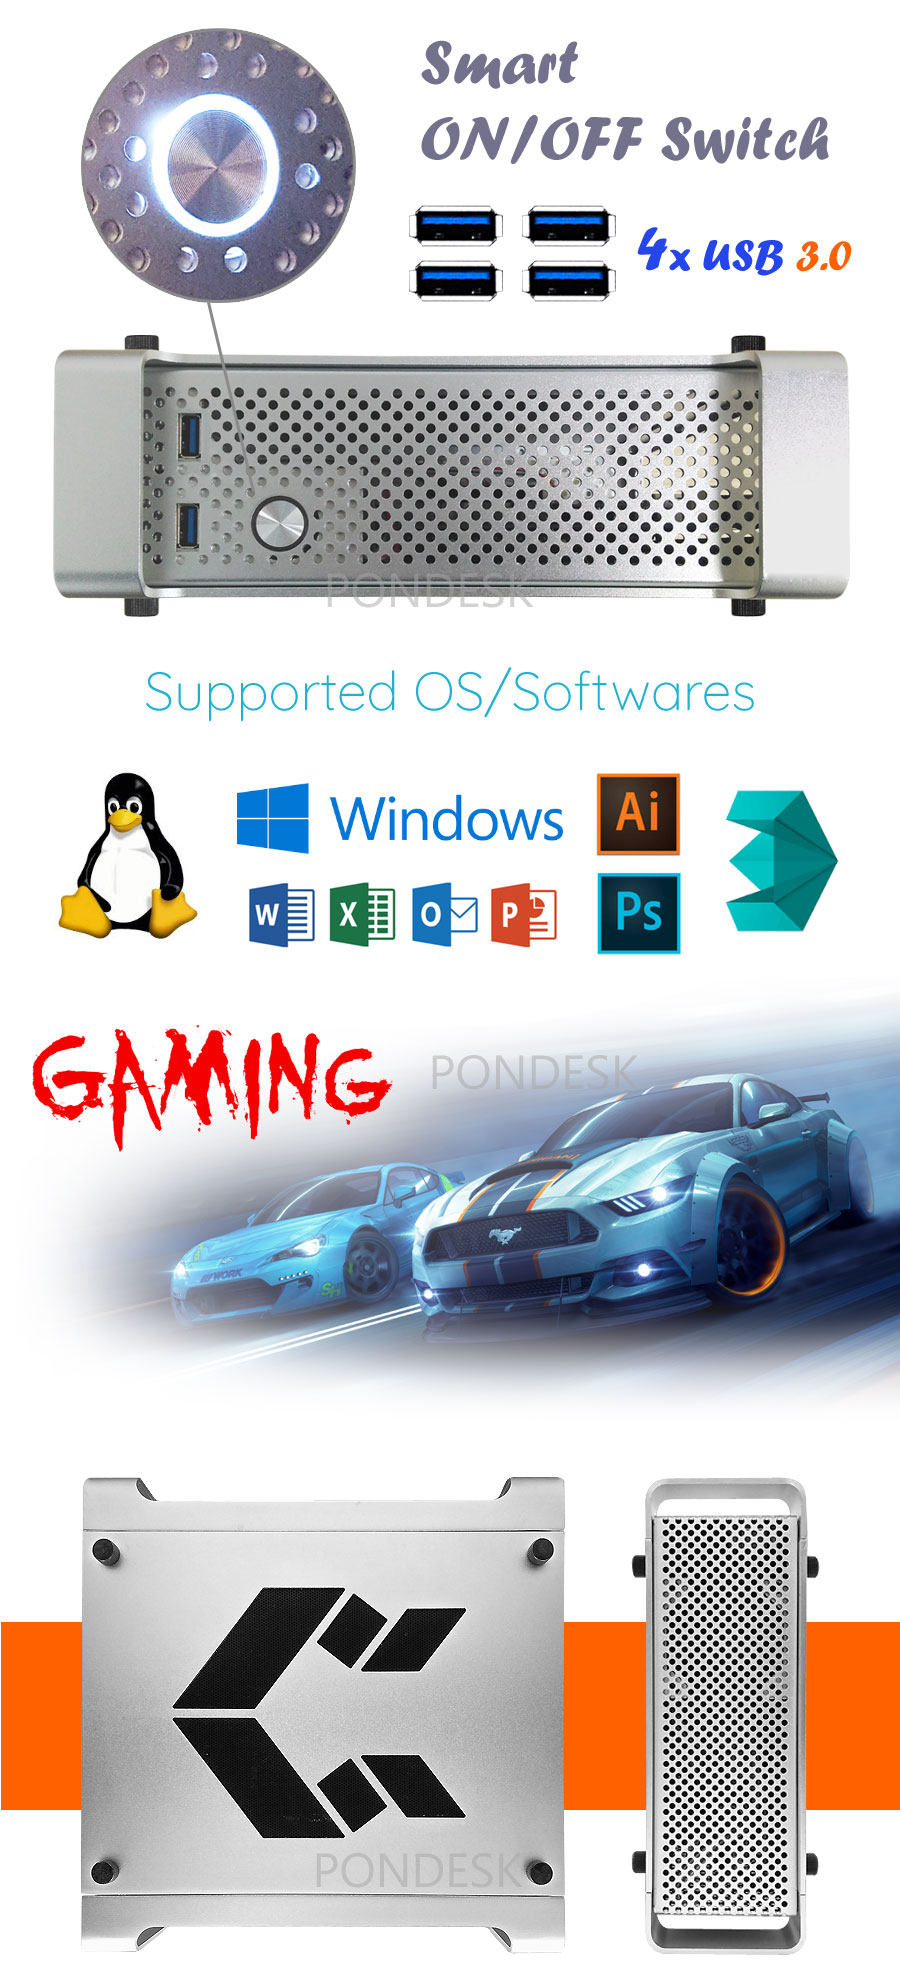 7th Gen Intel® i7-7700T Kaby Lake 3.8GHz HD 630 Mini Desktop - DTHO-007   Image